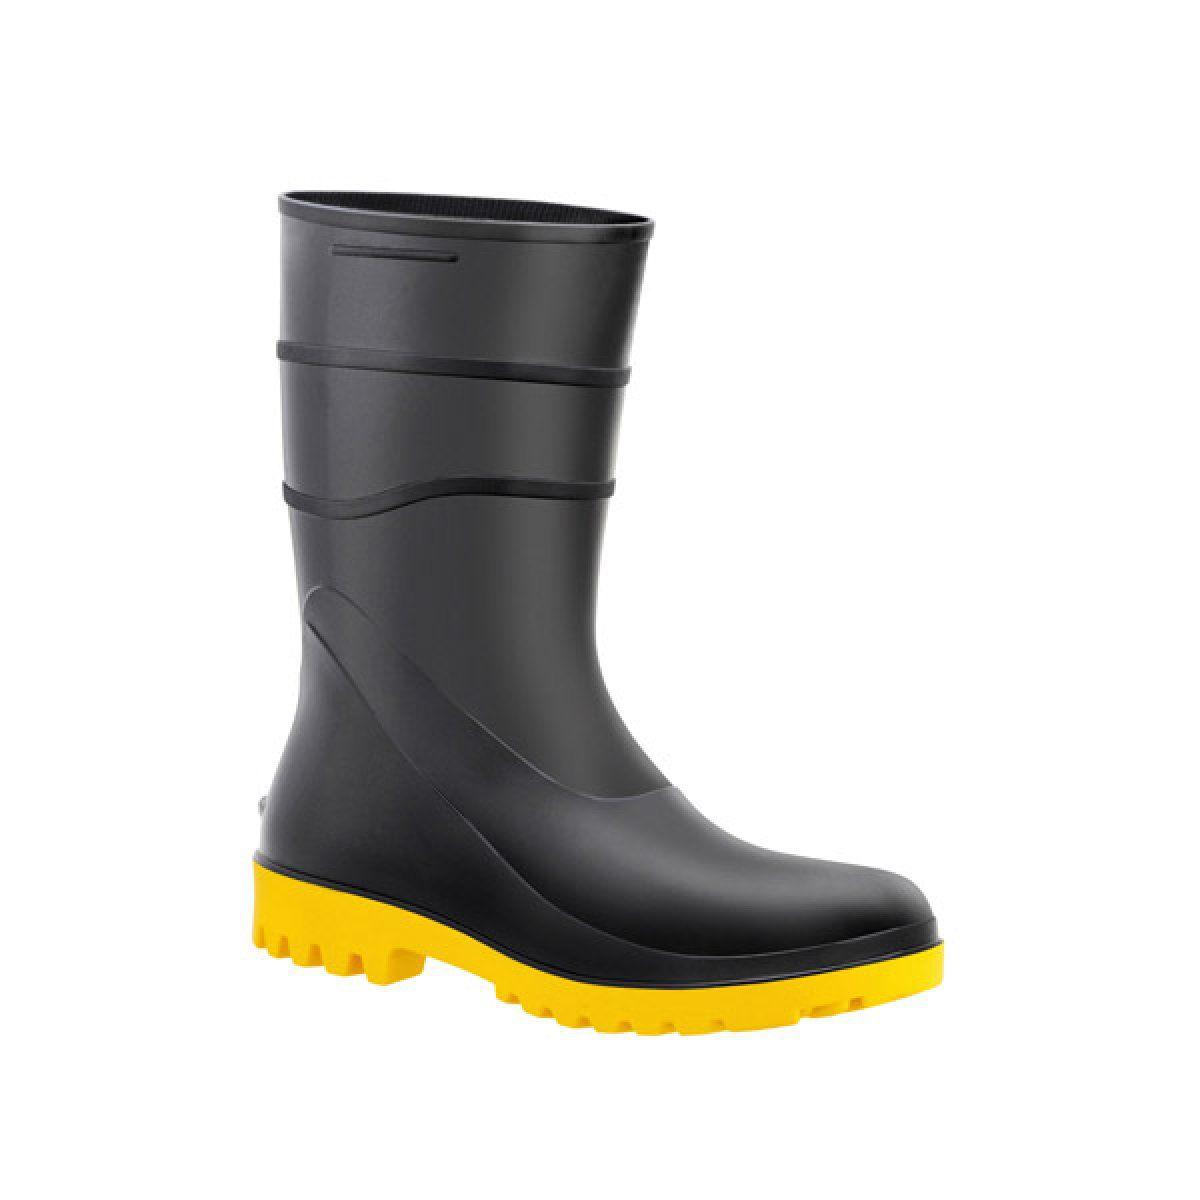 Bota de PVC Preta c/ Solado Amarelo N°43 - BRACOL